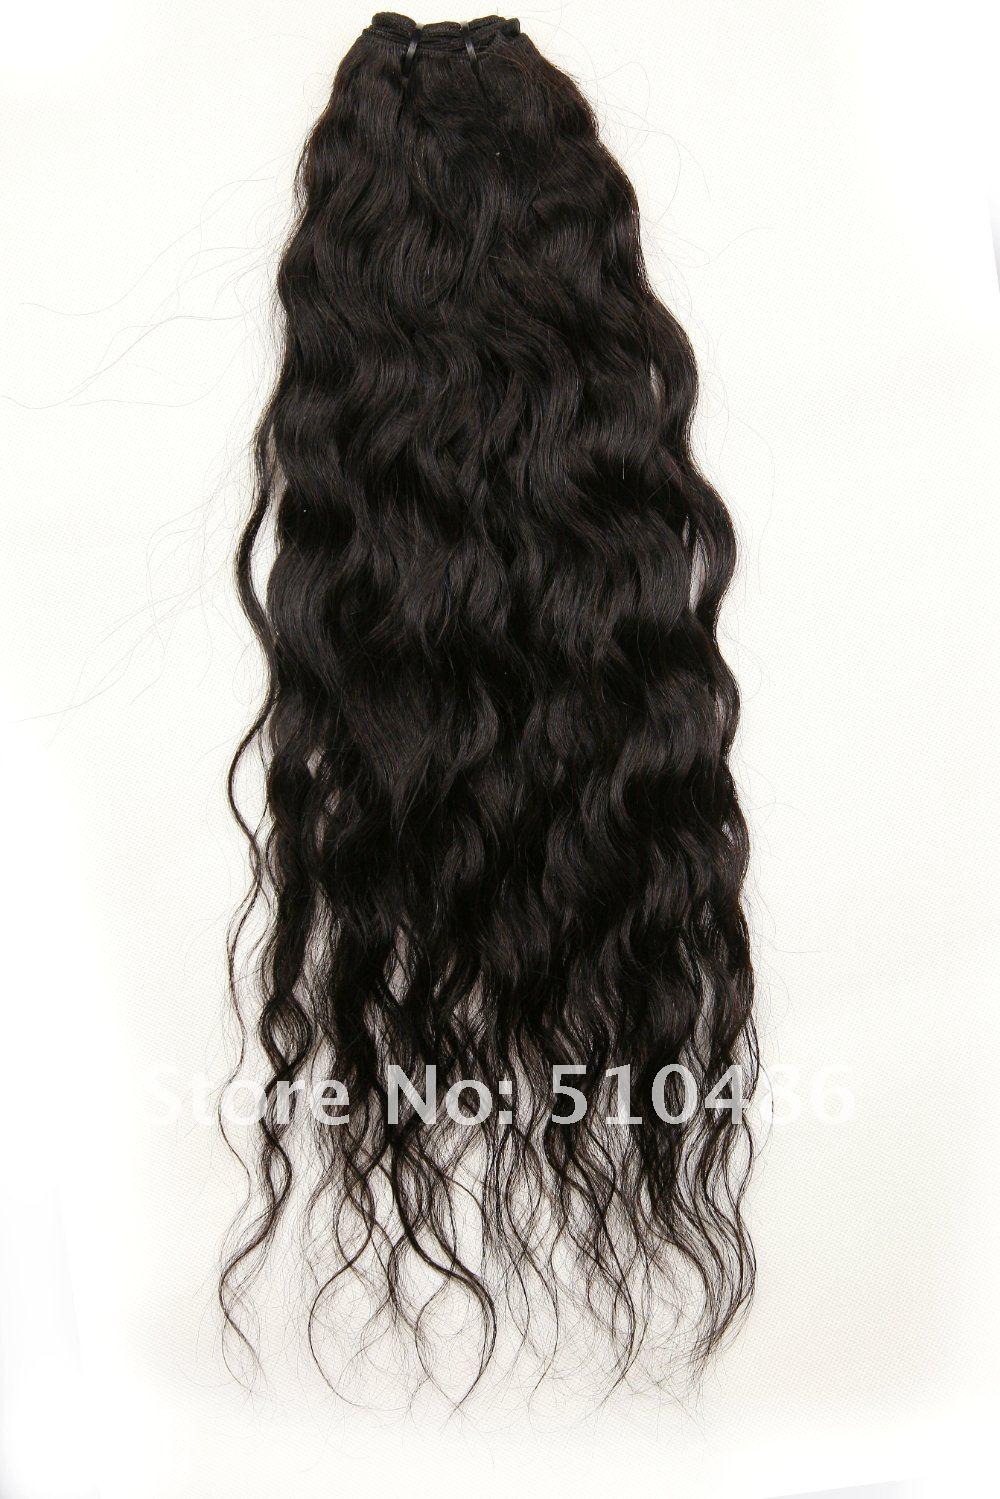 Virgin Remy Human Hair Weave